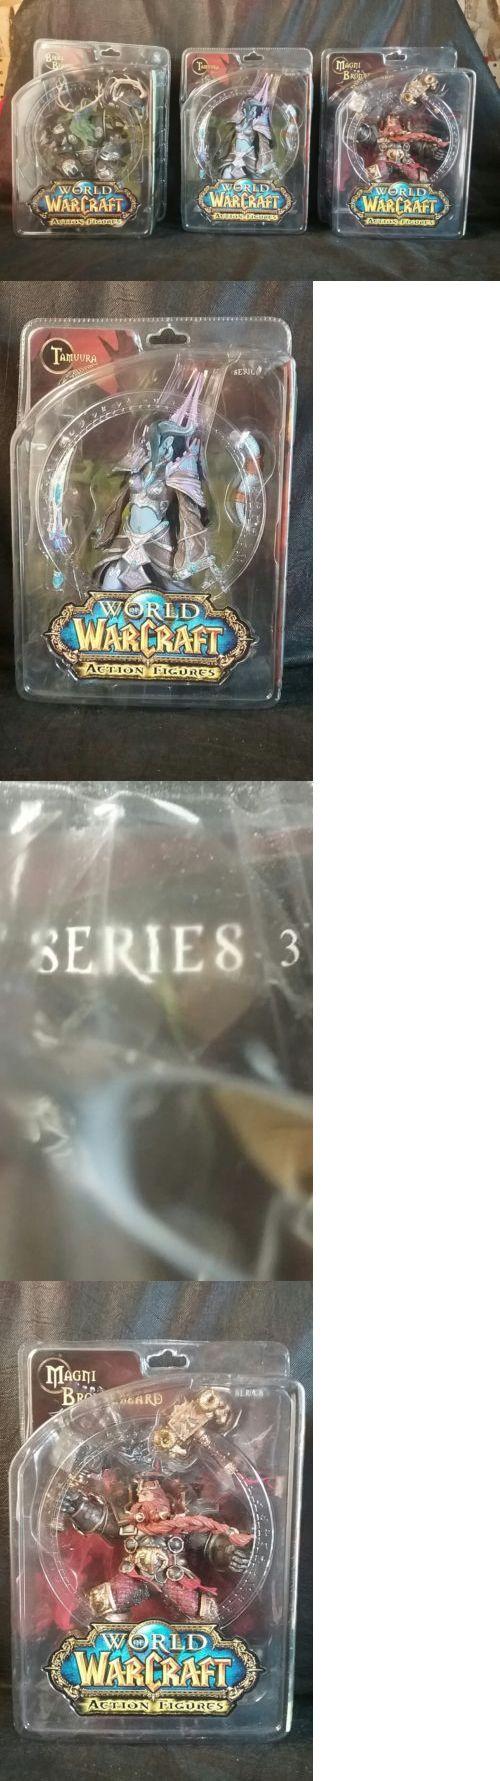 World of Warcraft 168258: World Of Warcraft Figures Lot Tamuura Bronzebeard Bearmantle Series 3, 2, 6 2008 -> BUY IT NOW ONLY: $130 on eBay!